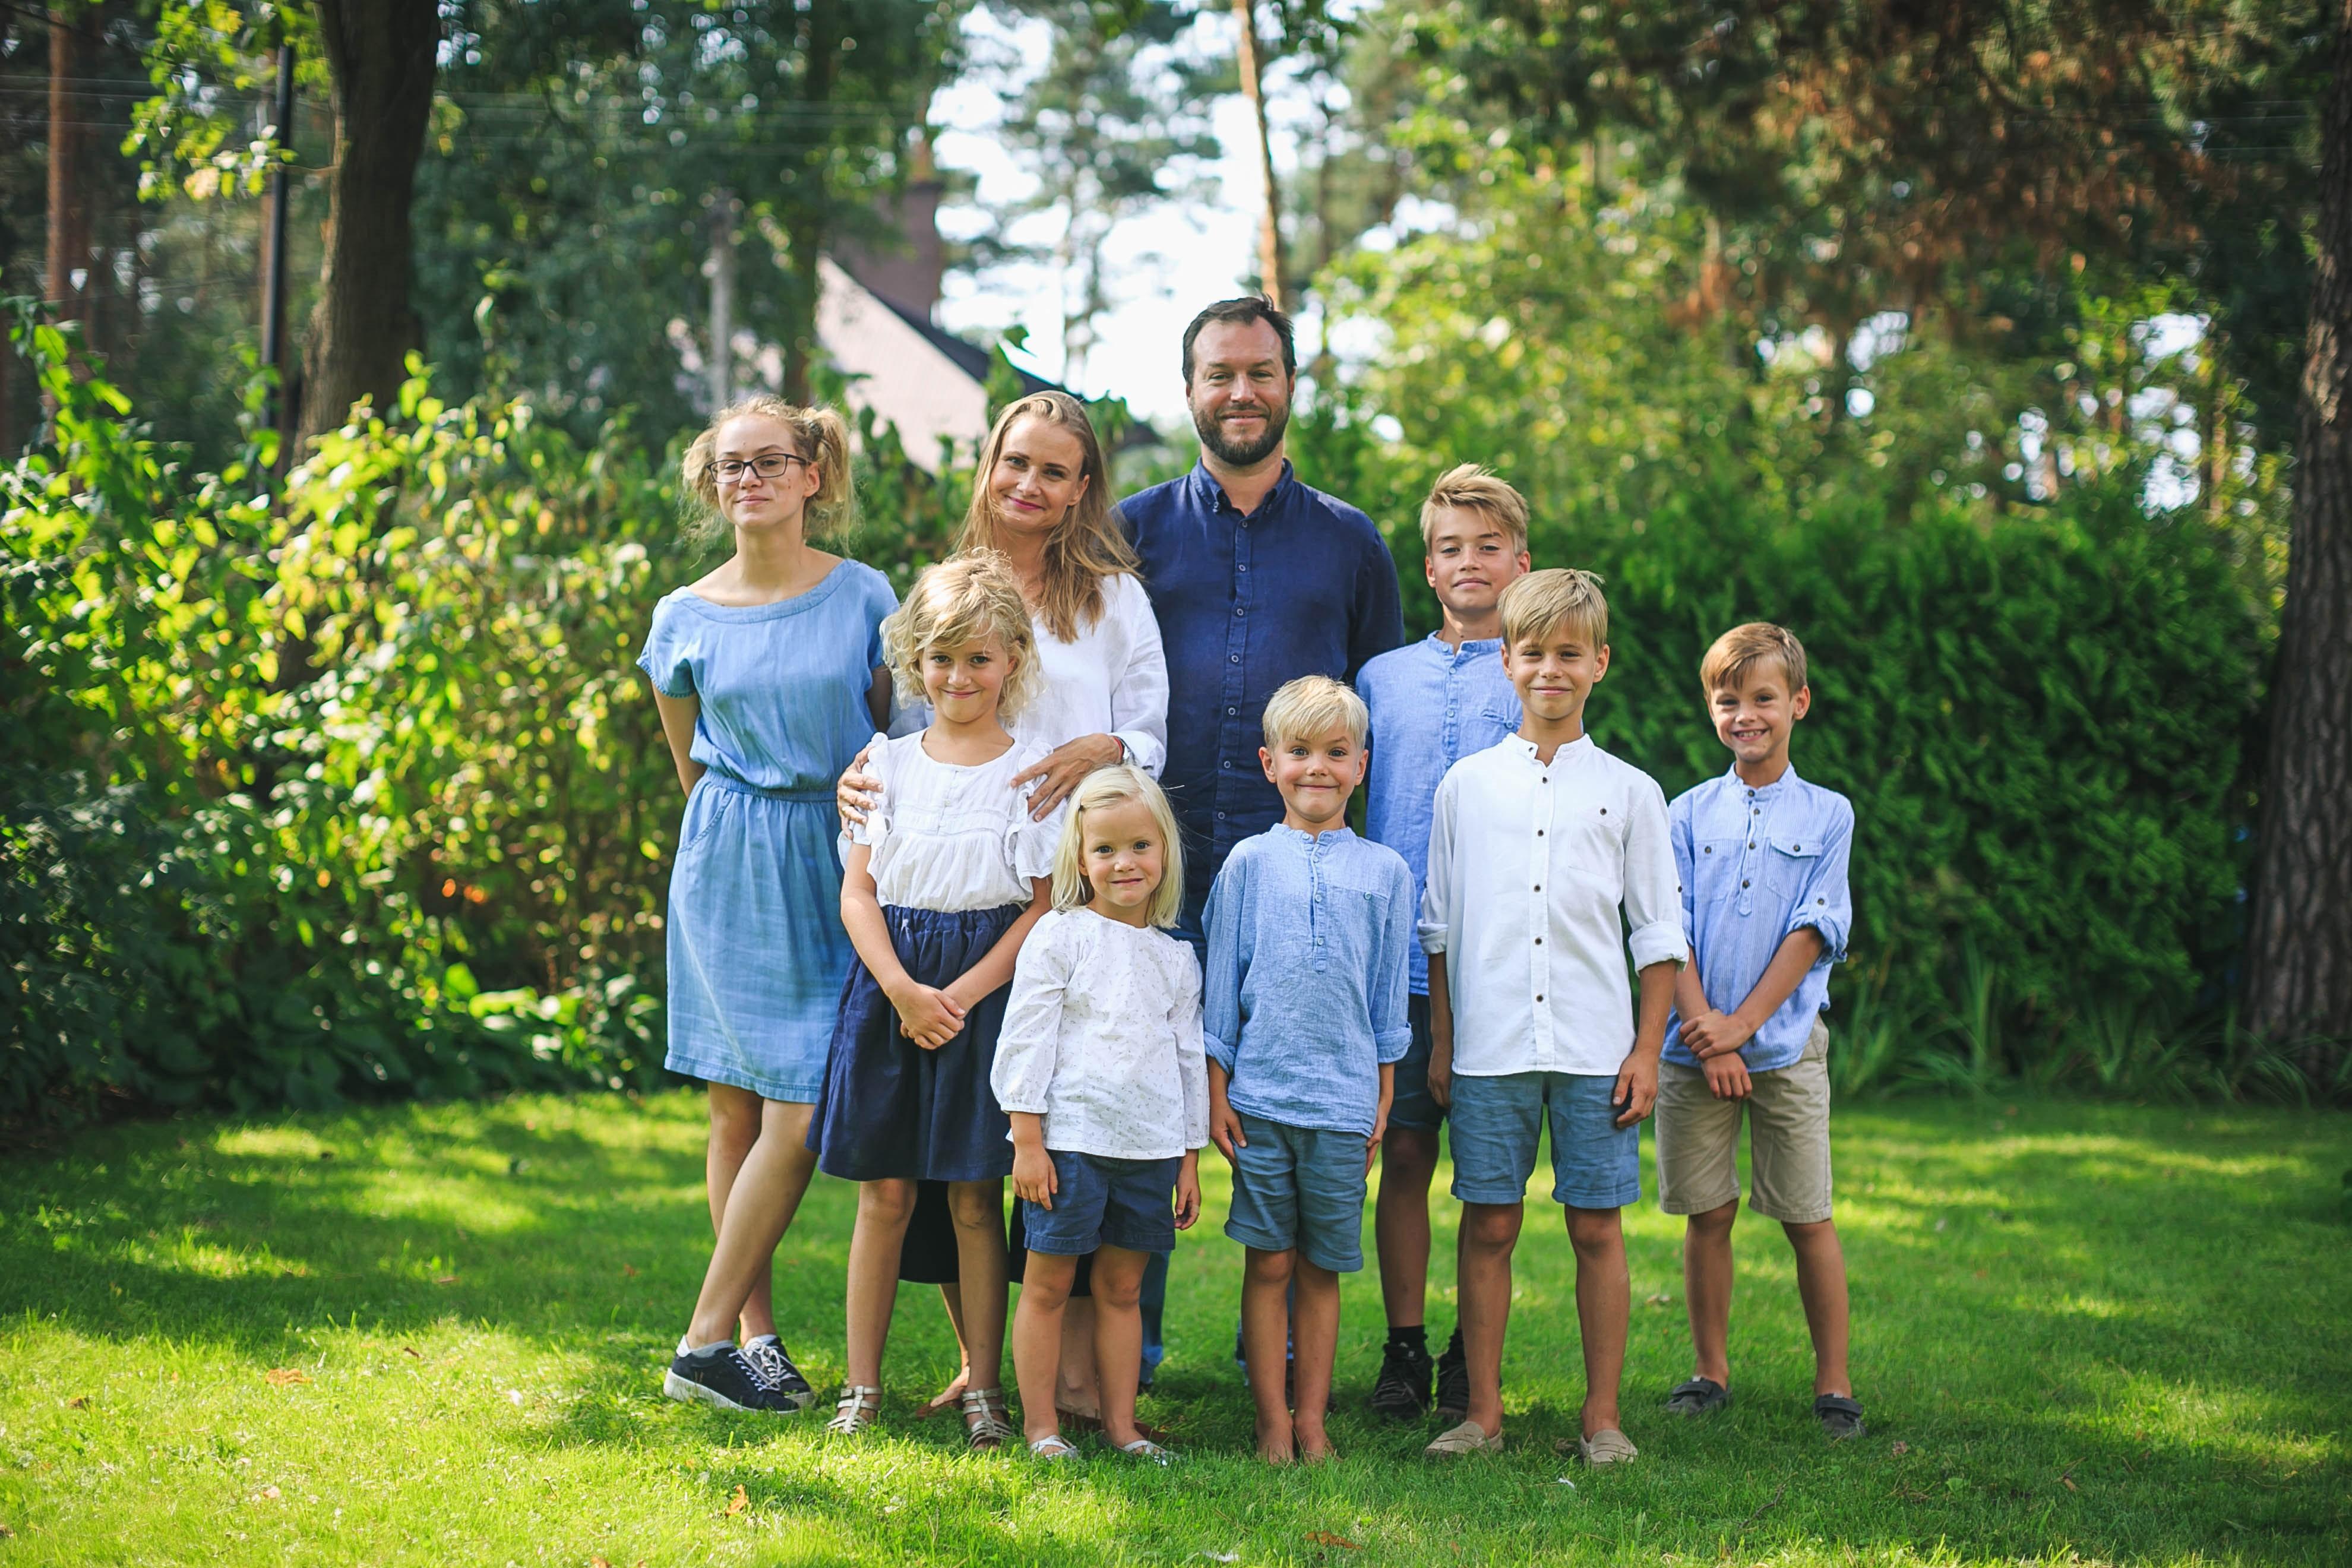 FAMILYFUNBYMOM, INSTAGRAM